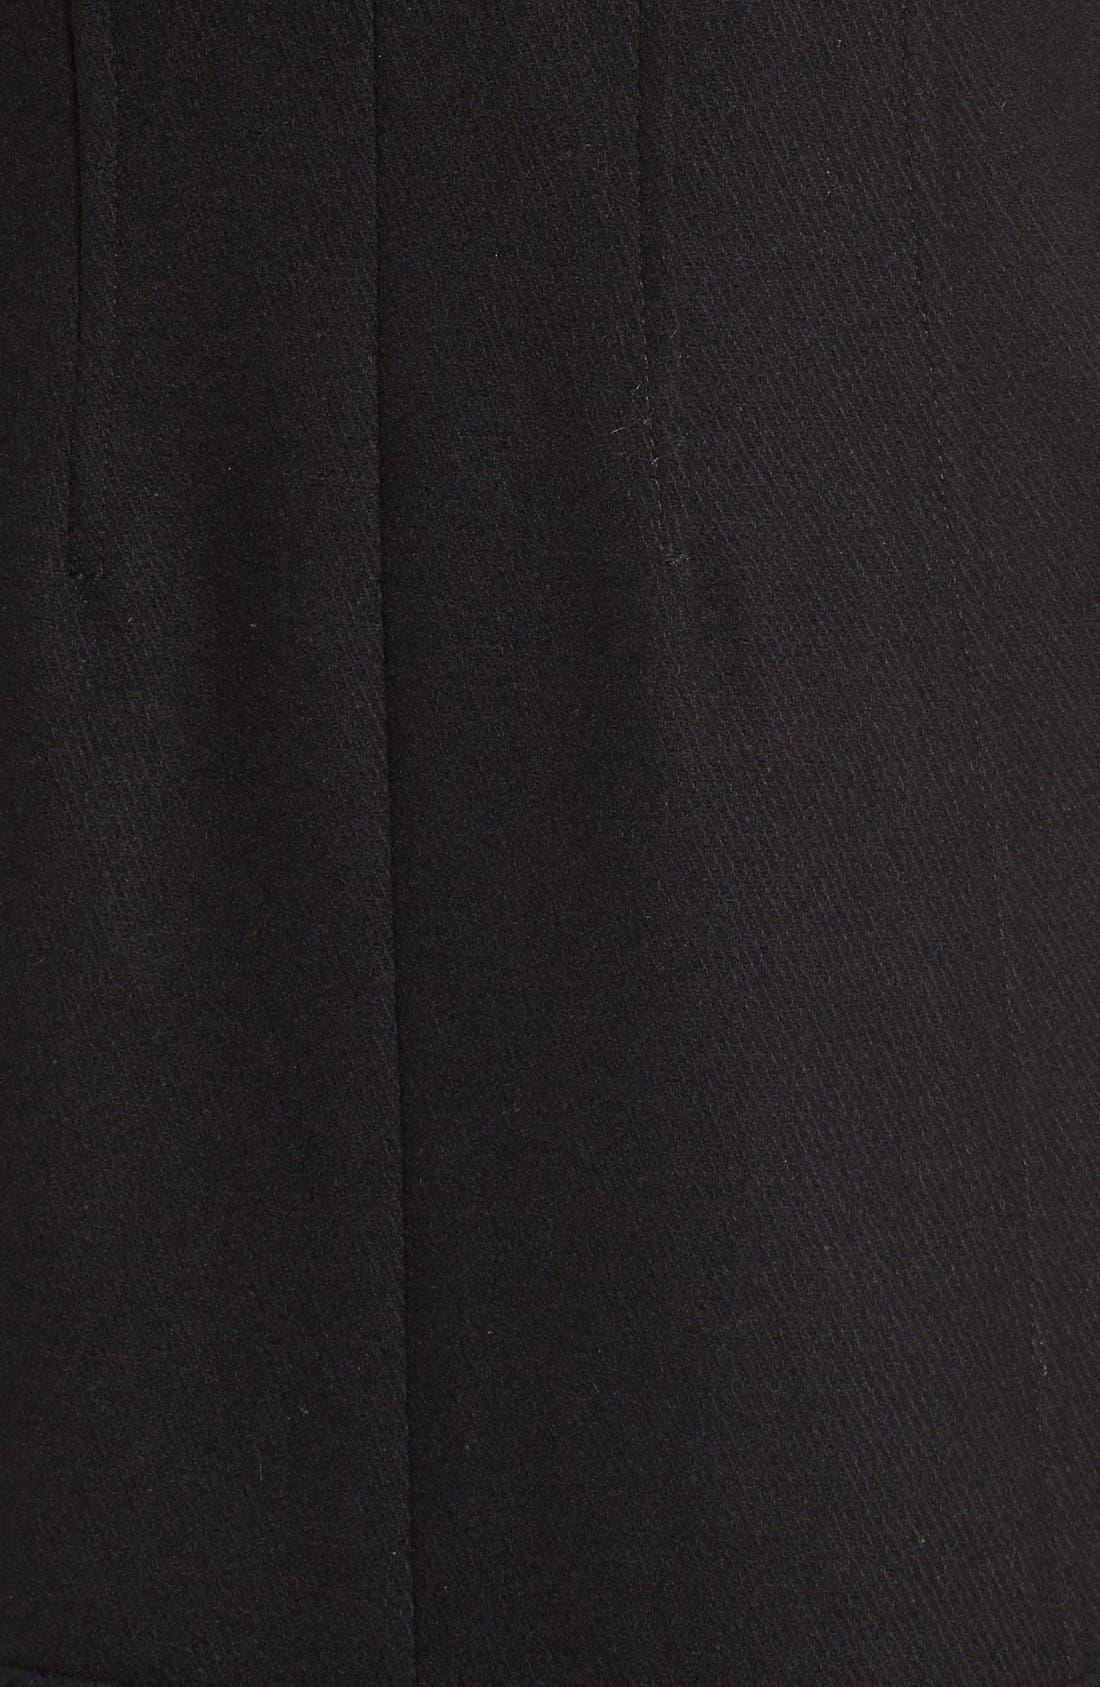 Bouclé Sleeve Wool Blend Military Coat,                             Alternate thumbnail 5, color,                             001